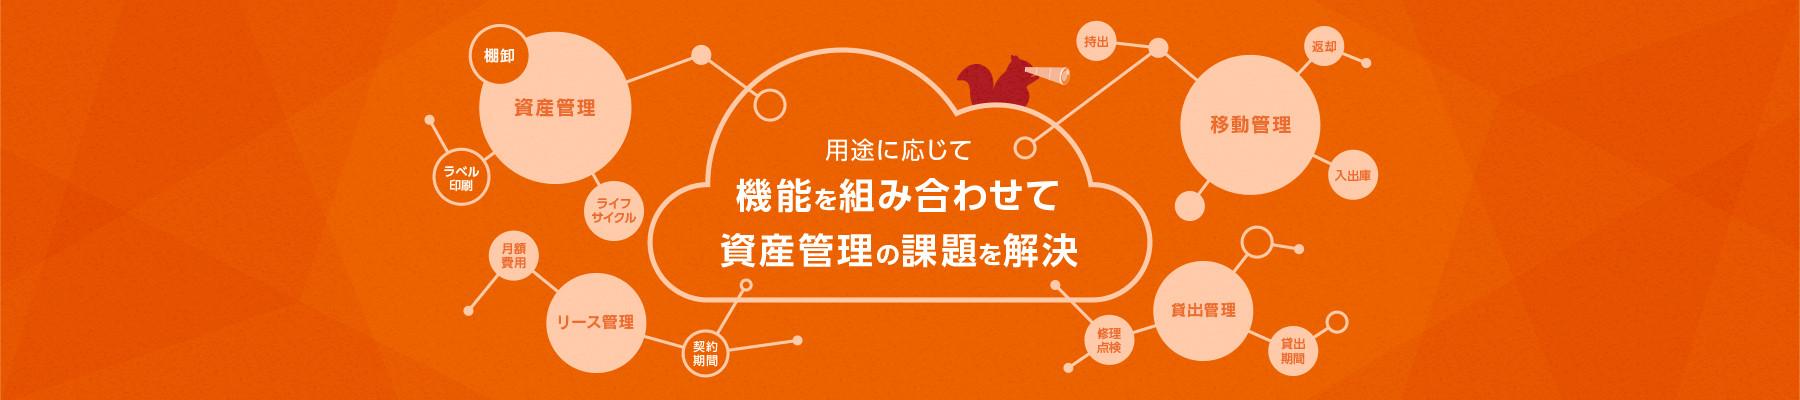 mv_03_pc.jpg